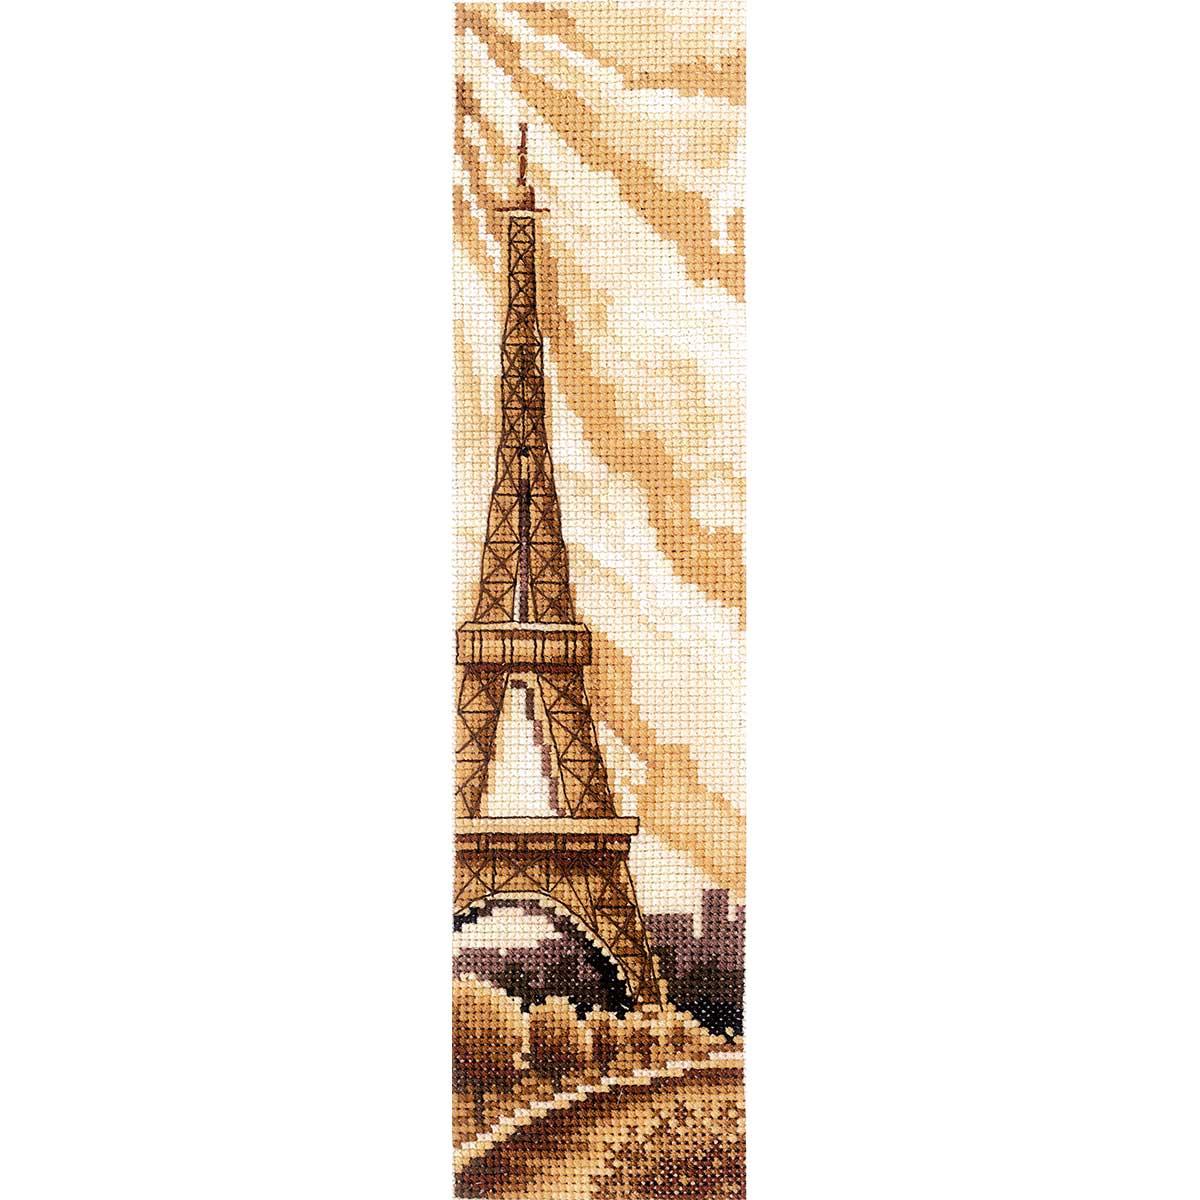 З-52 Набор для вышивания 'Закладки. Париж' 5,5 х 22см